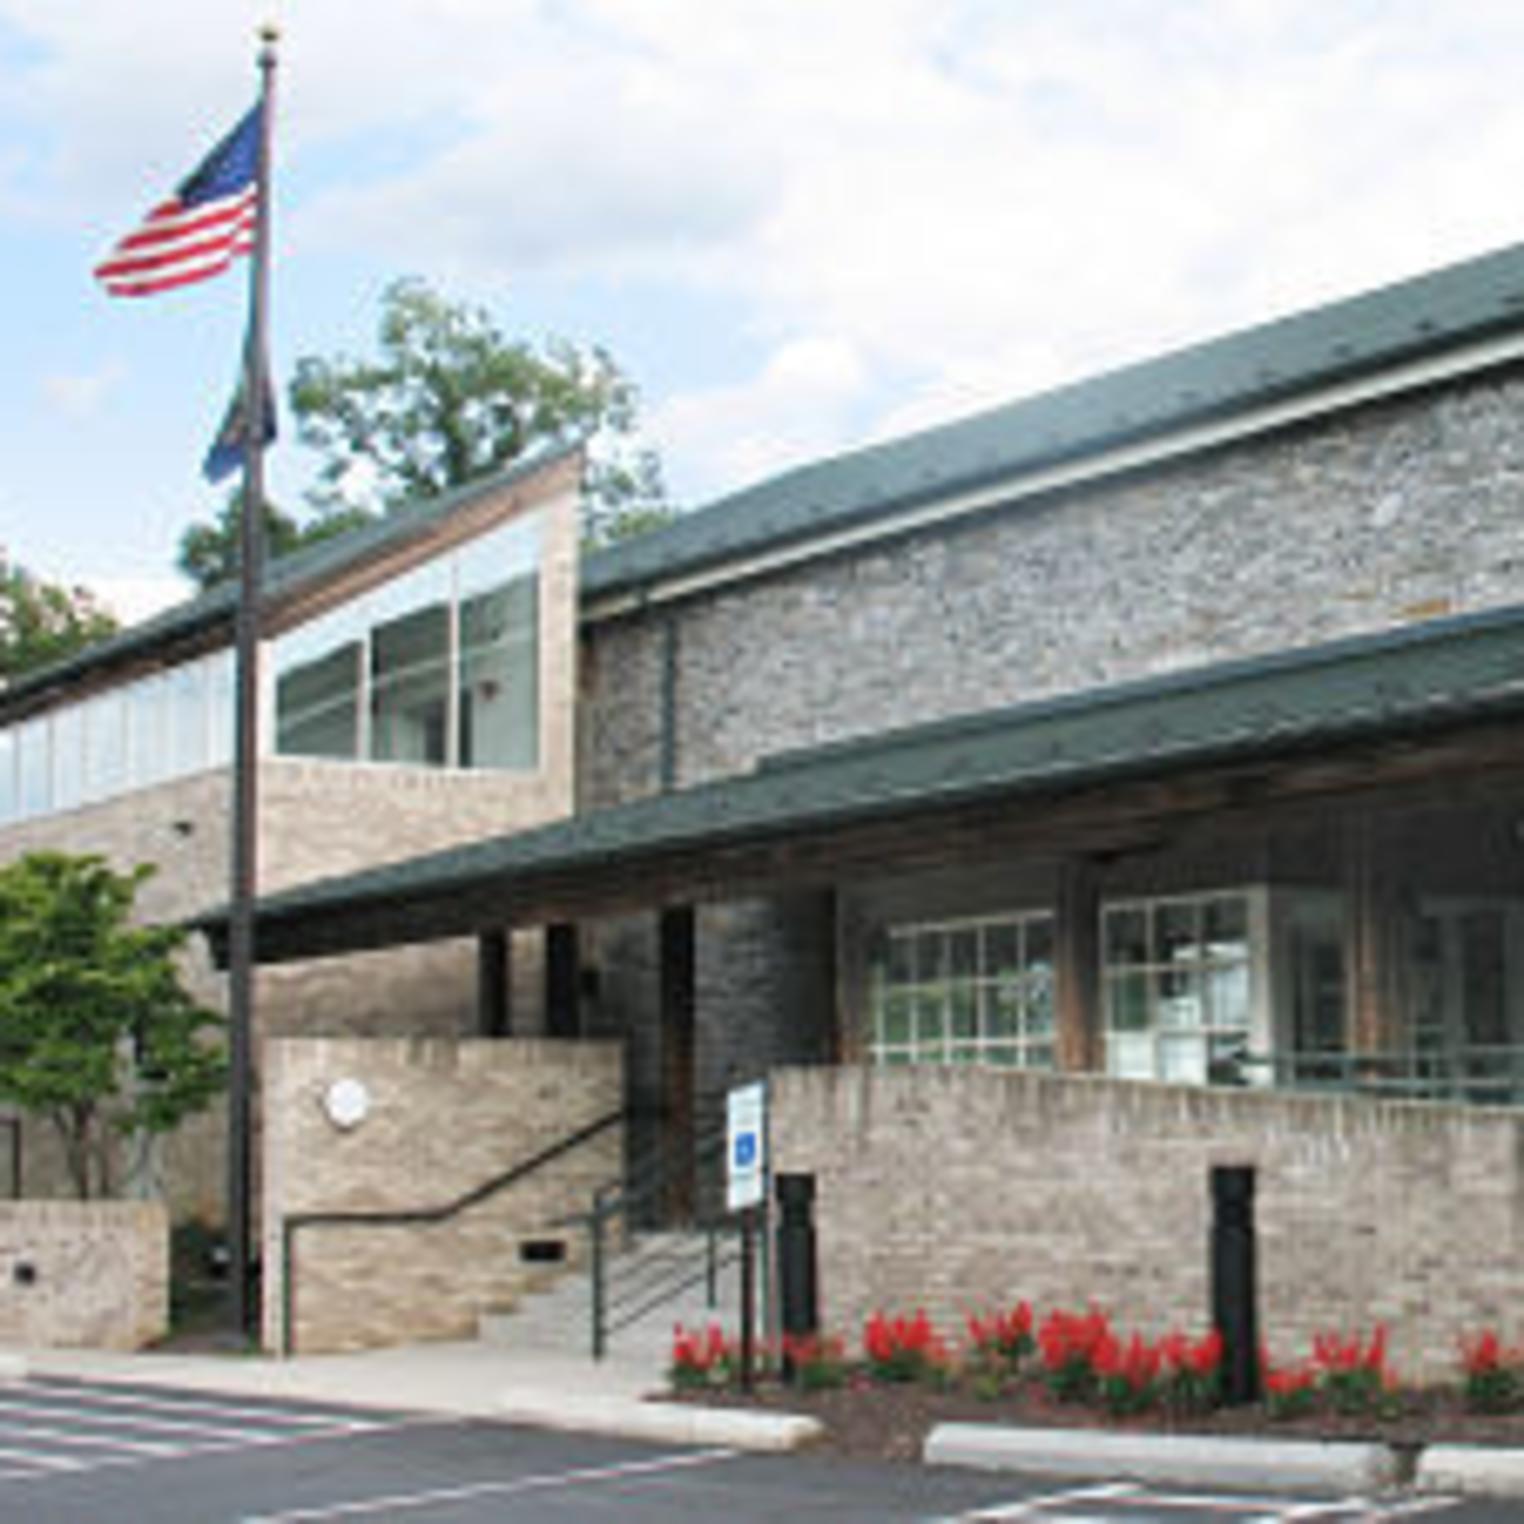 Simpson Public Library